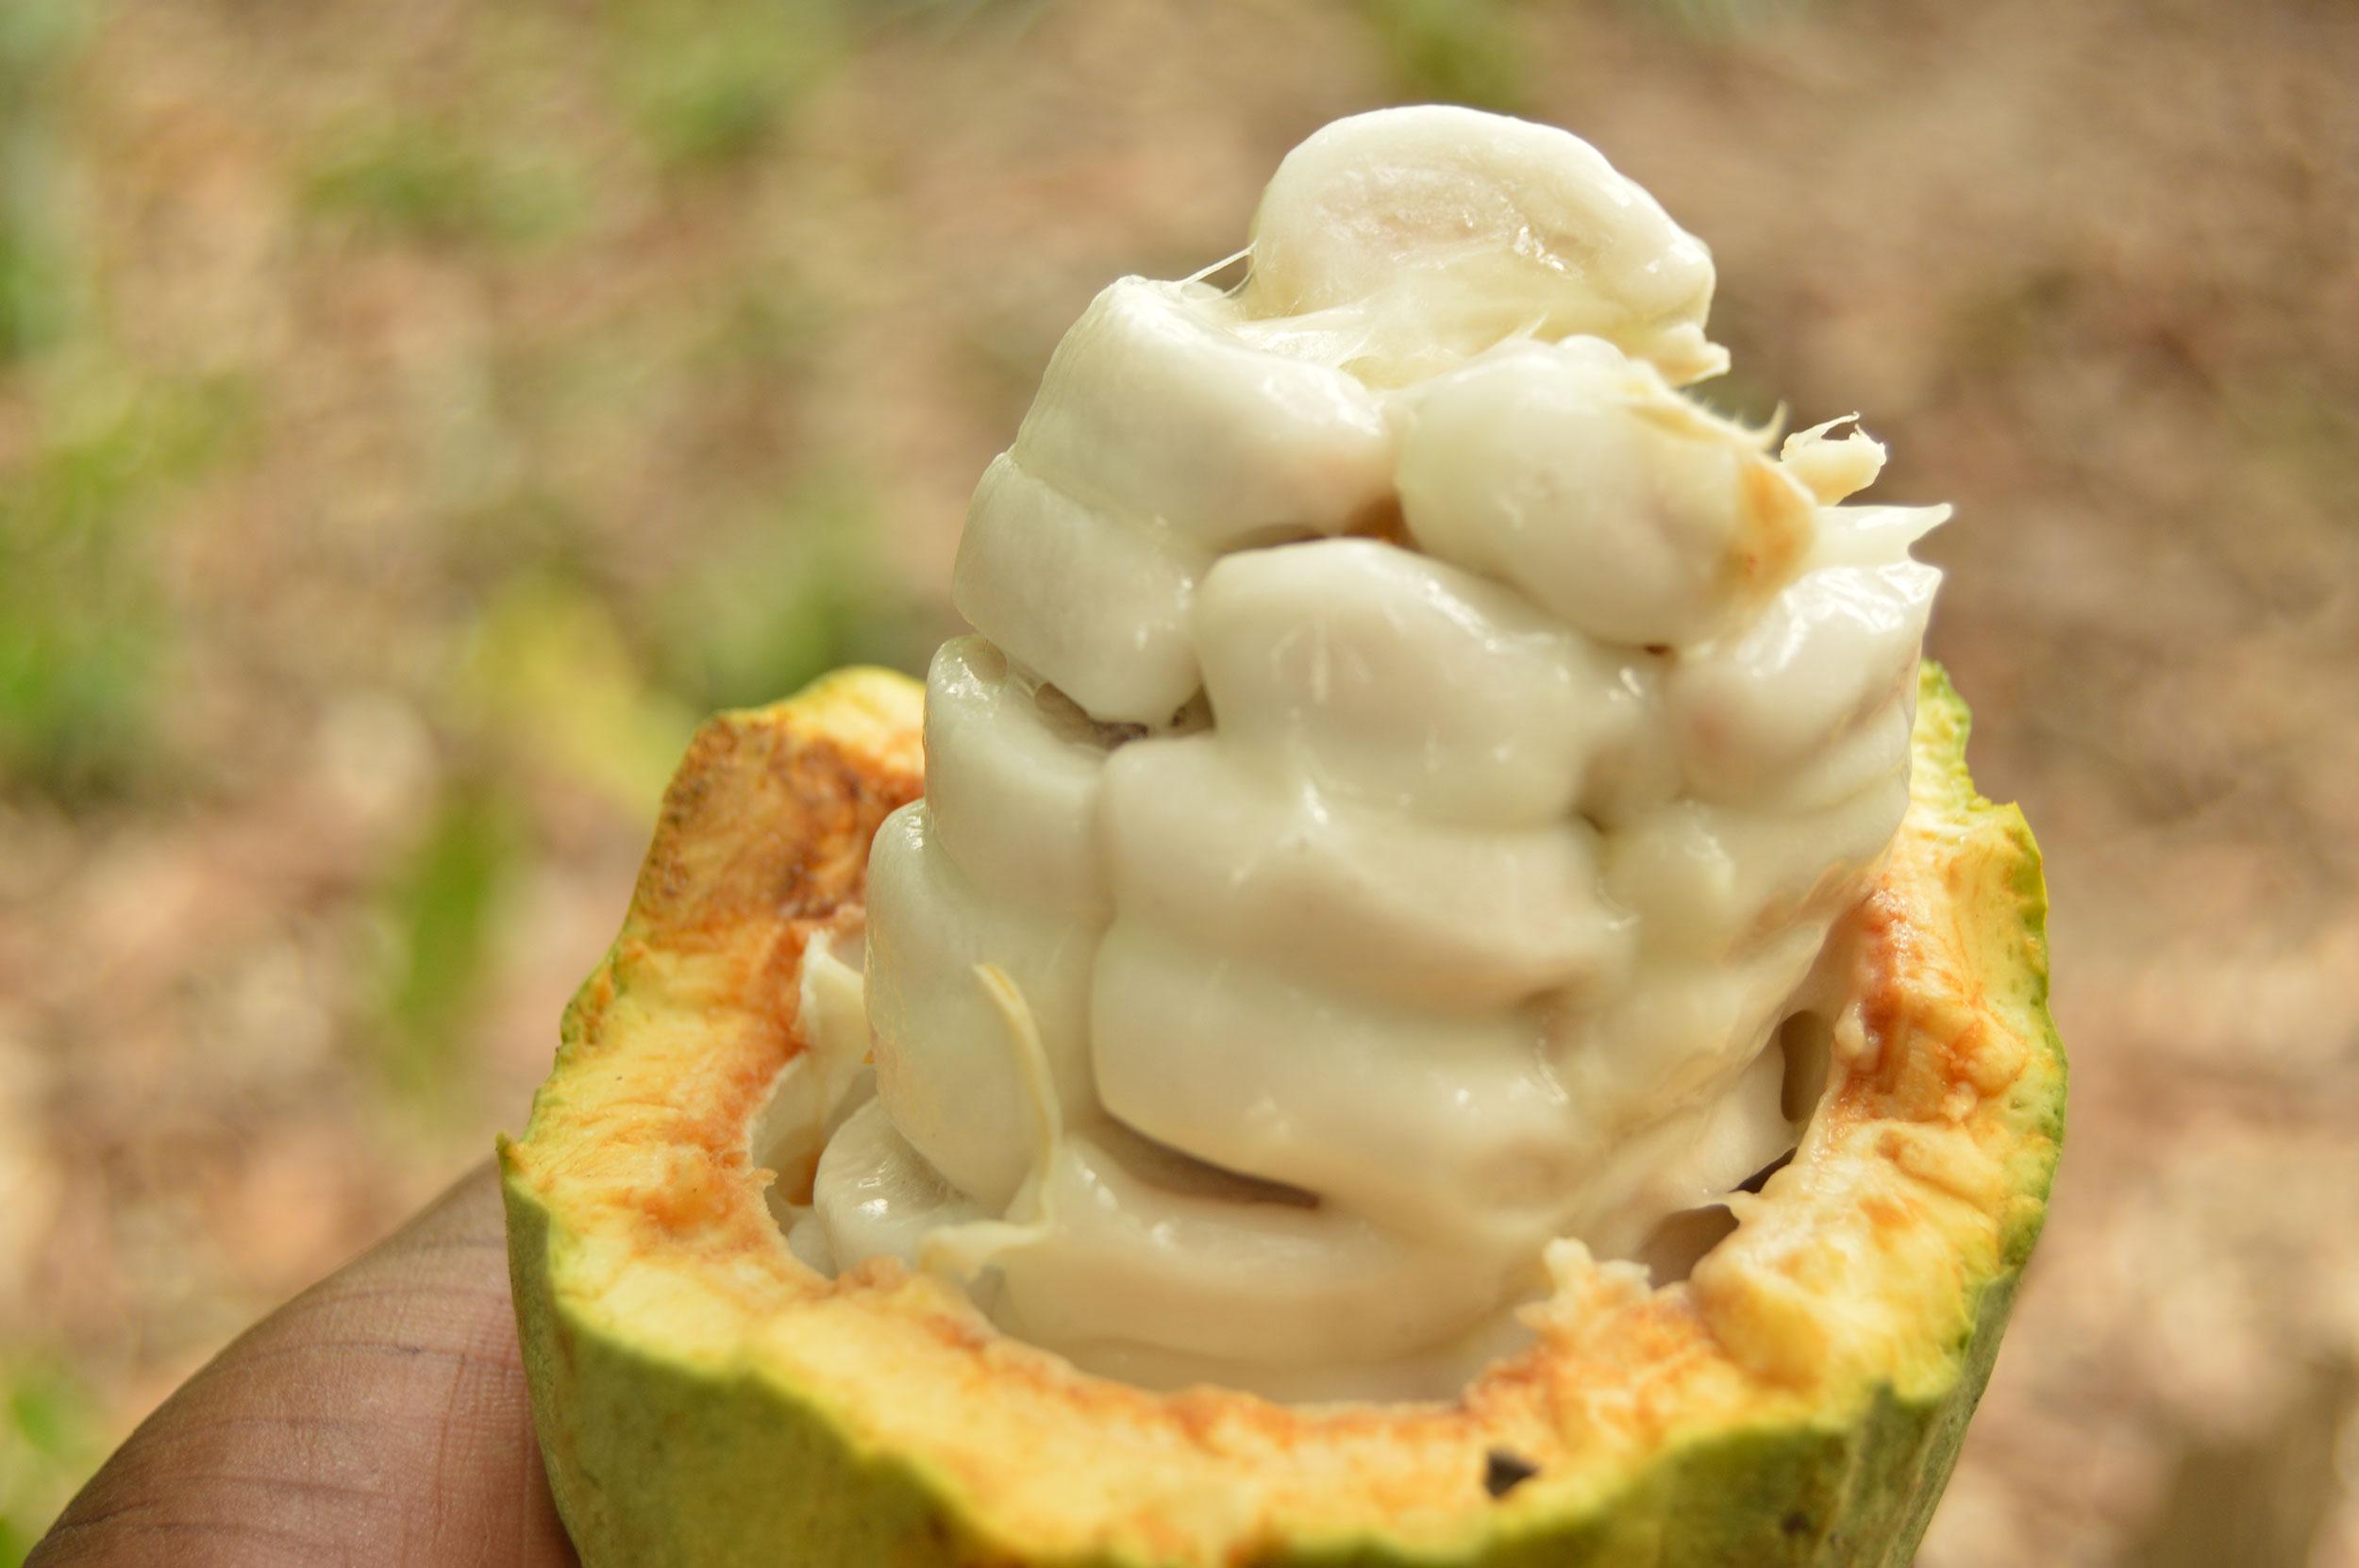 Cocoa drink made from cocoa juice and cocoa bean shells by kokojoo